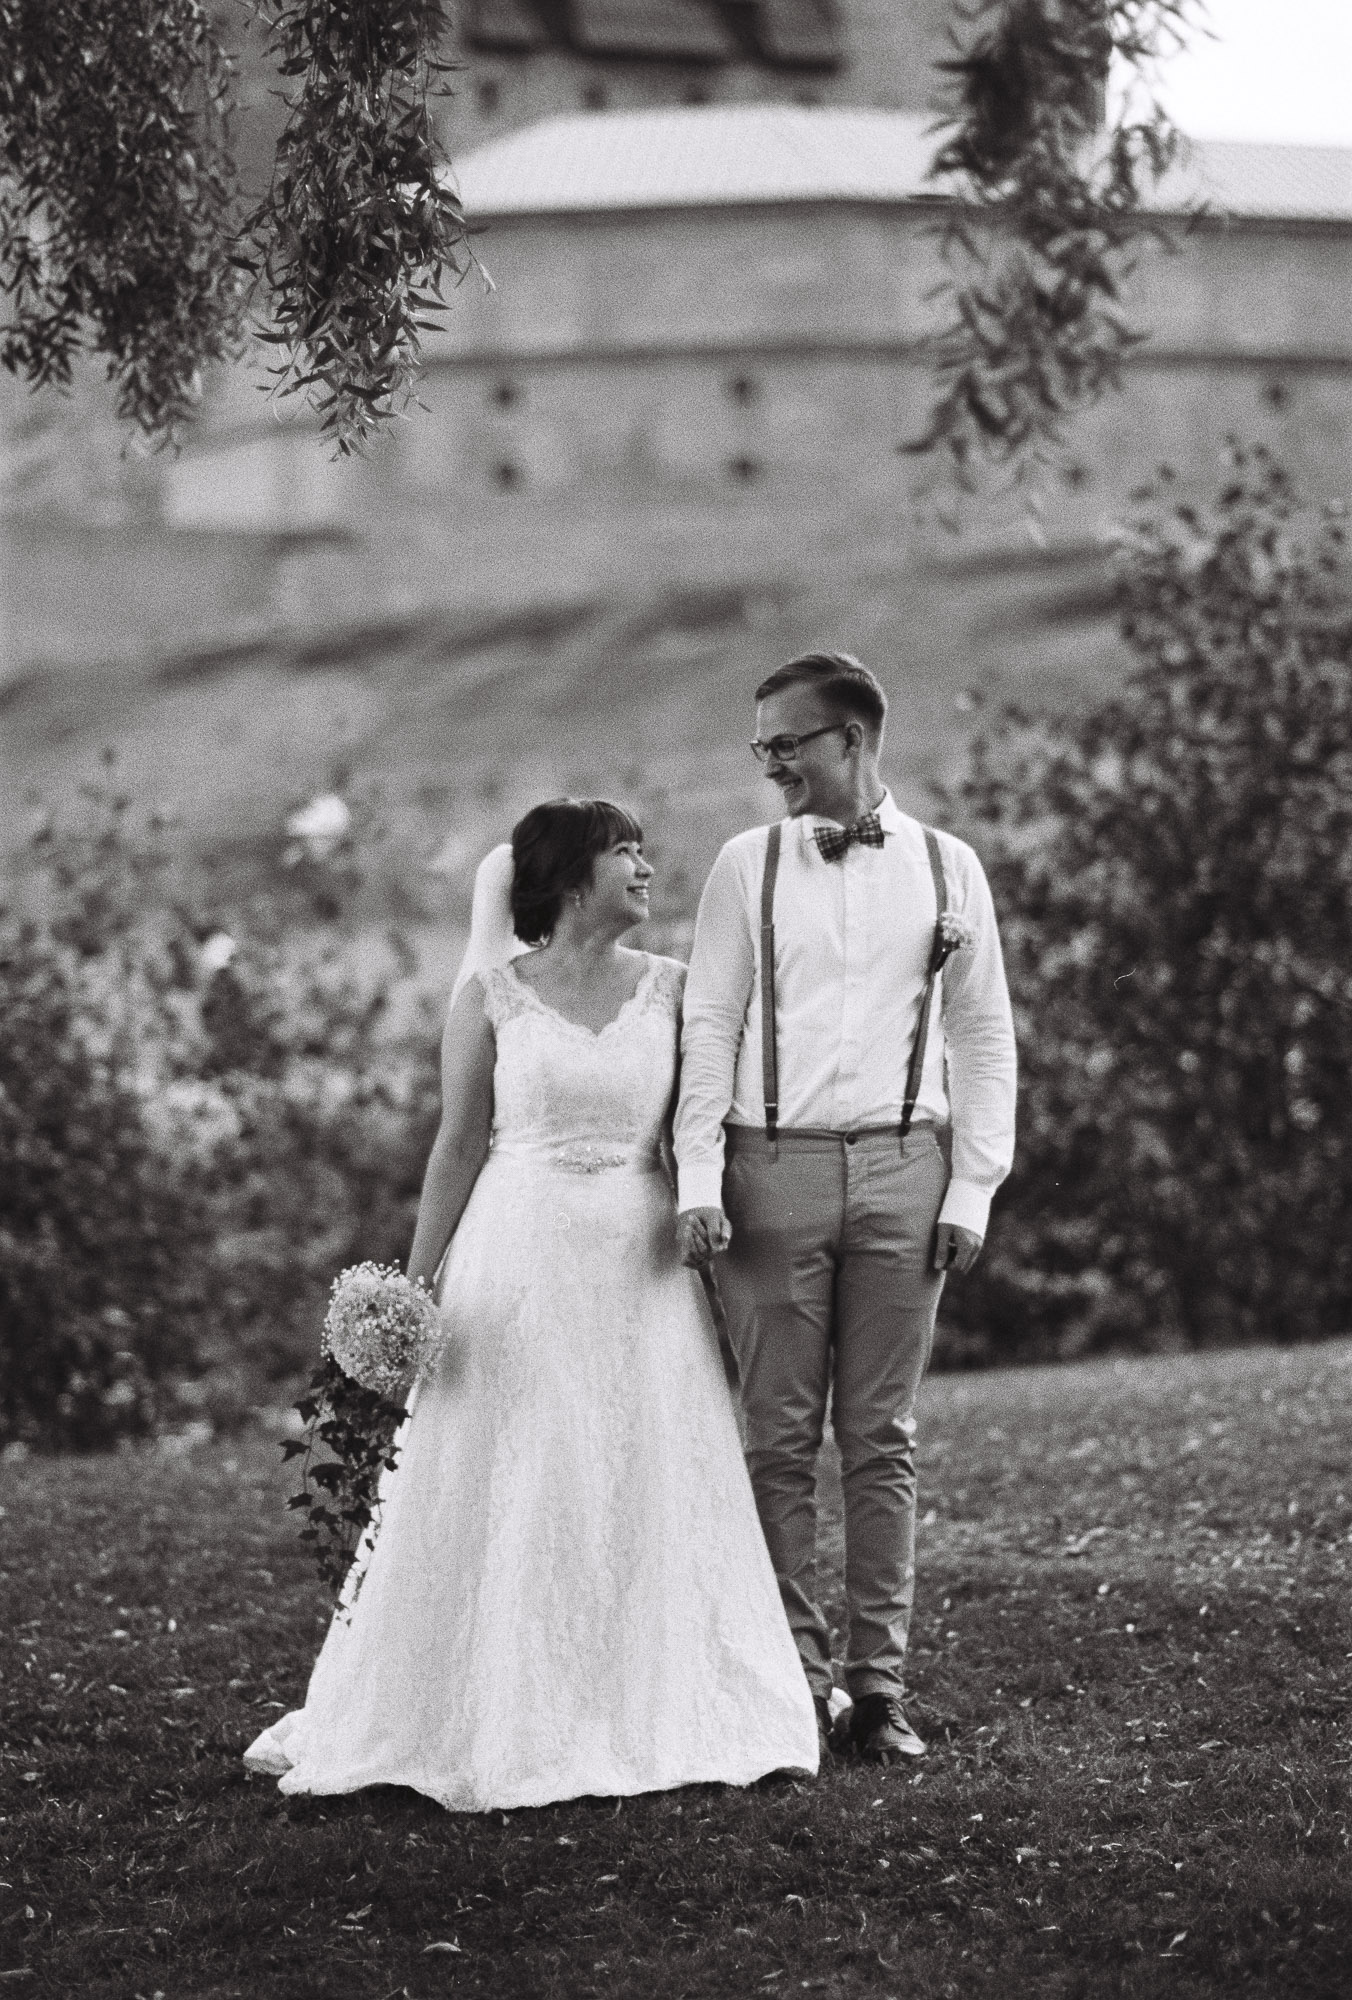 jere-satamo-analog-film-wedding-photographer-finland-153.jpg